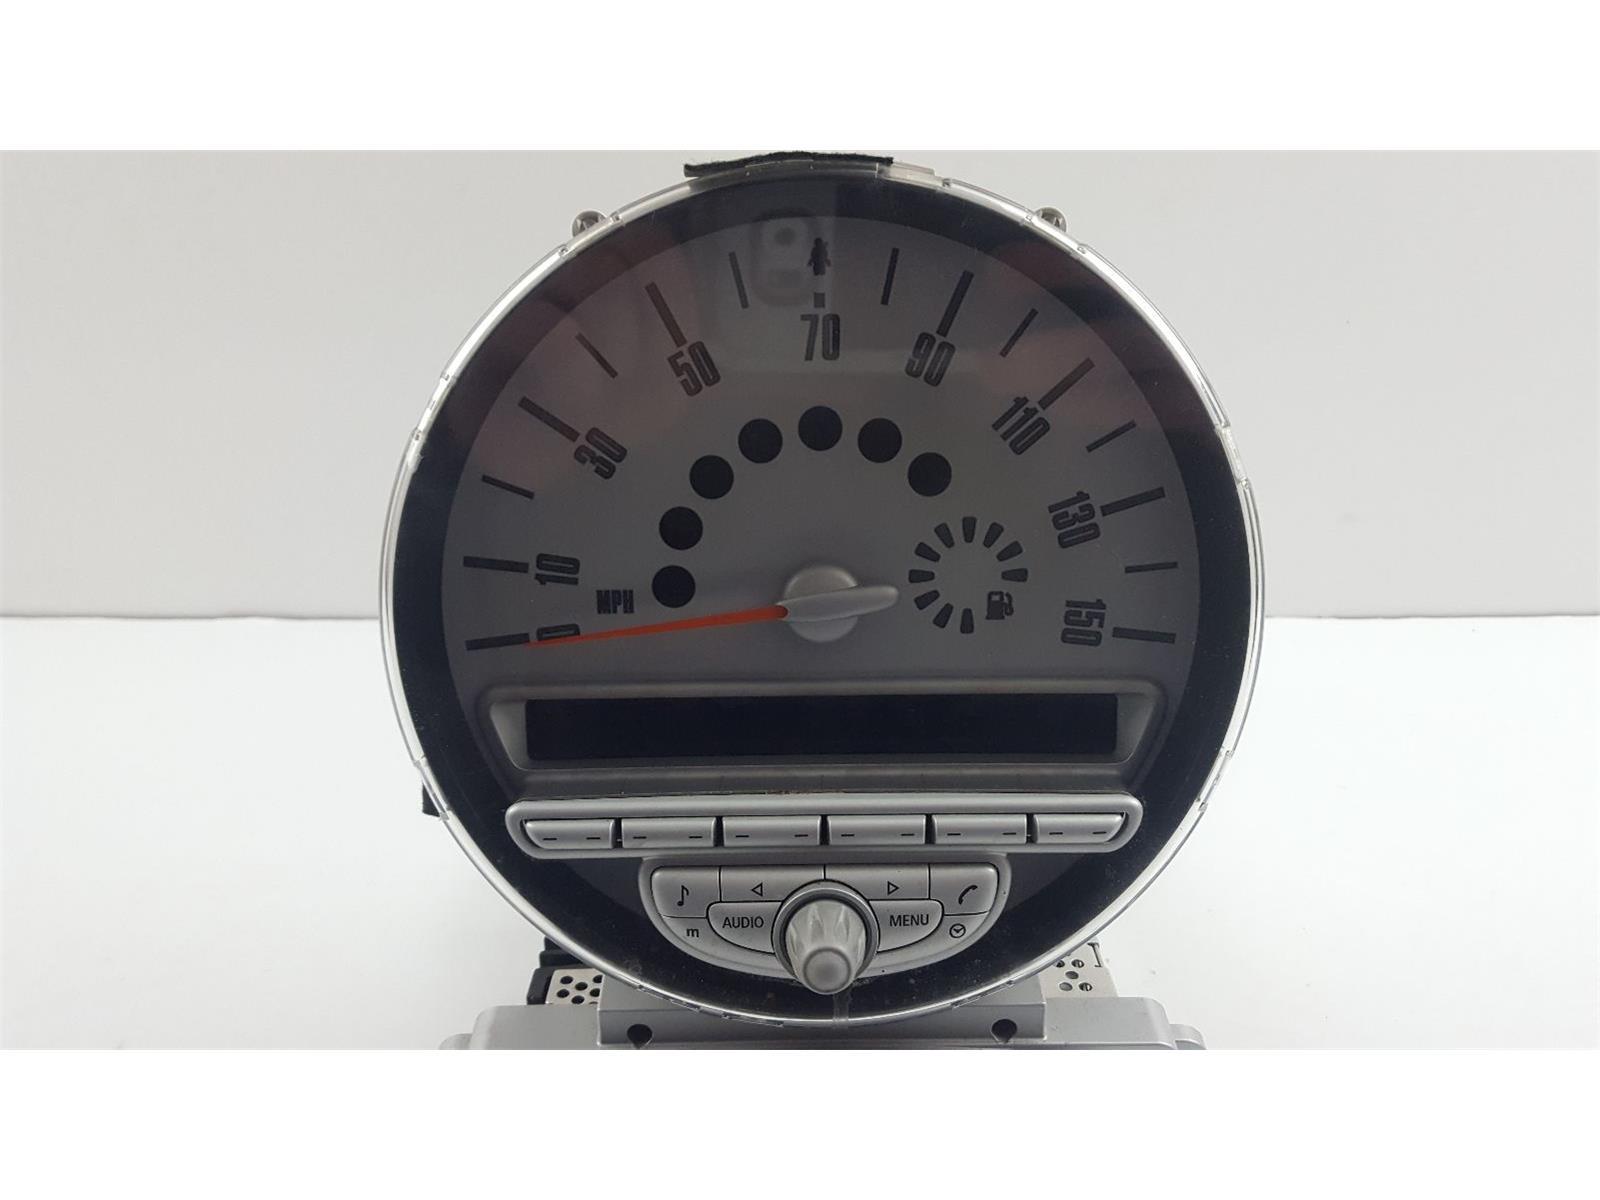 mini mini 2007 to 2014 radio cd player petrol manual for sale rh scbvehicledismantlers co uk mini radio boost cd manual 2012 mini radio boost cd manual 2008 pdf